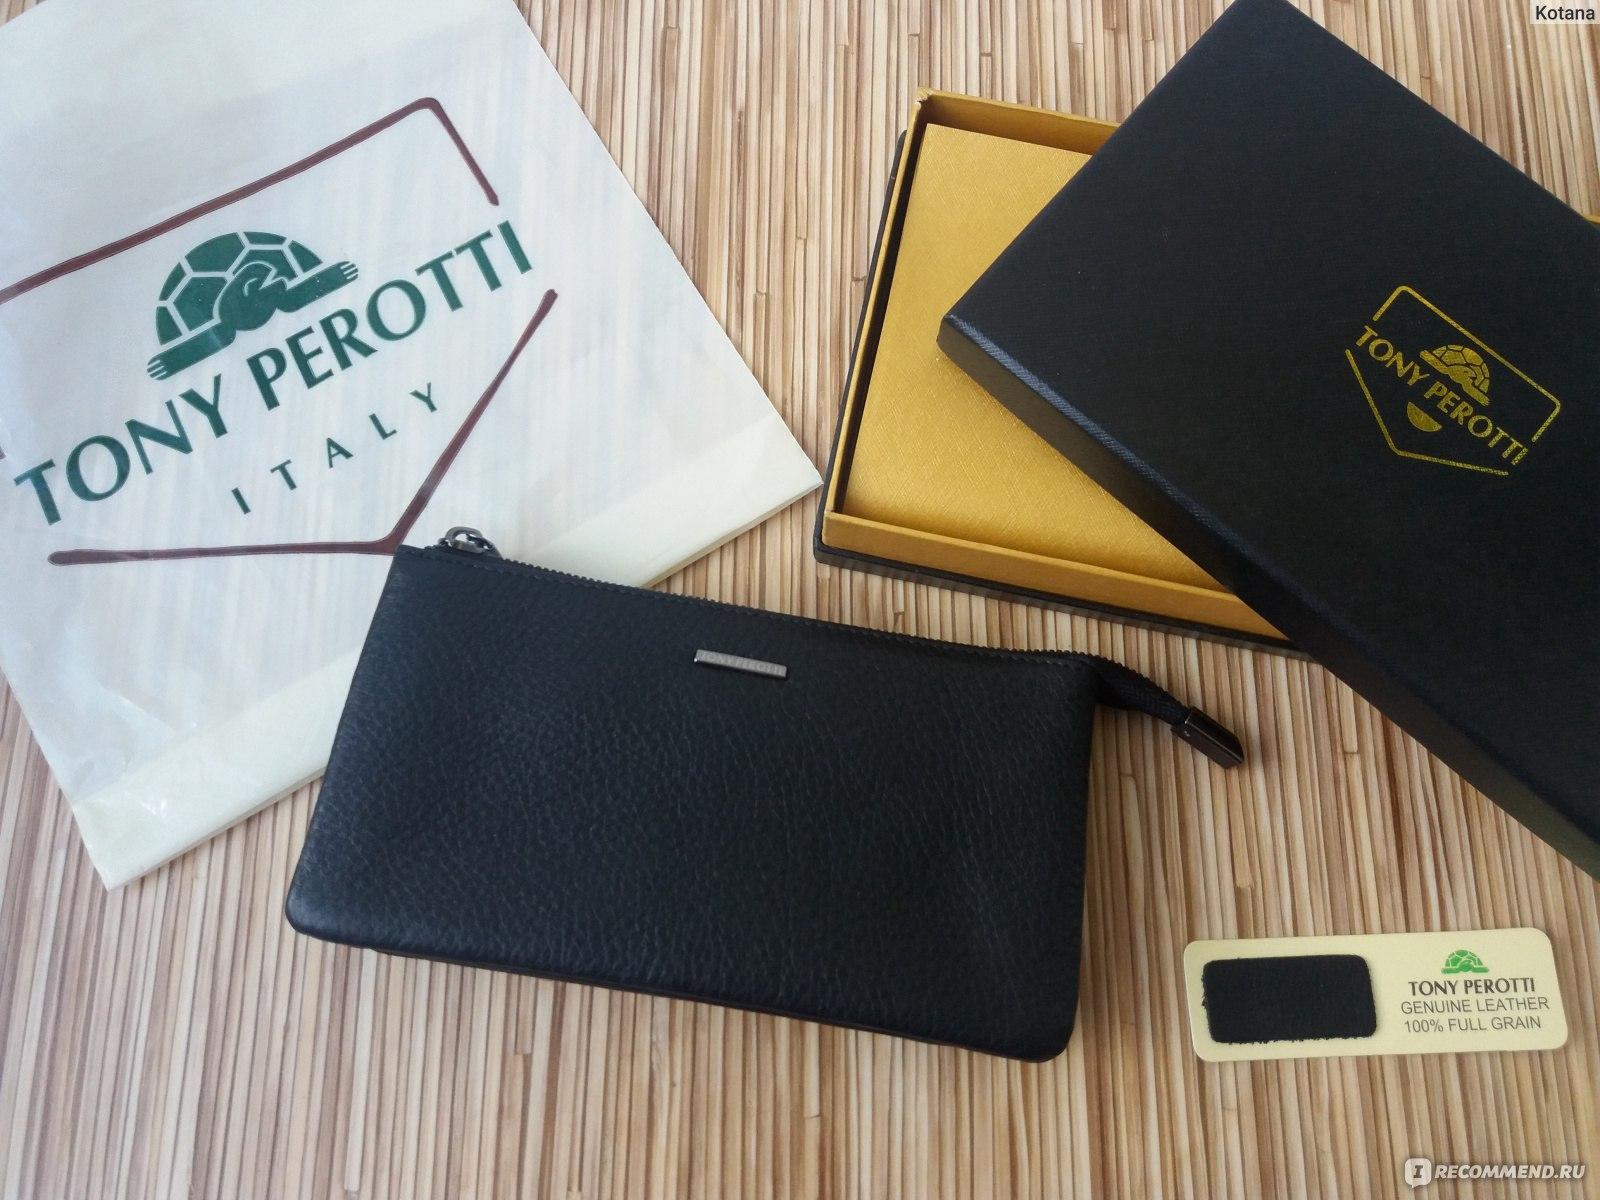 5dd50b316d2d Кошелек женский Tony Perotti Кожаный клатч-портмоне New Contatto АРТ:  2651-NCt фото